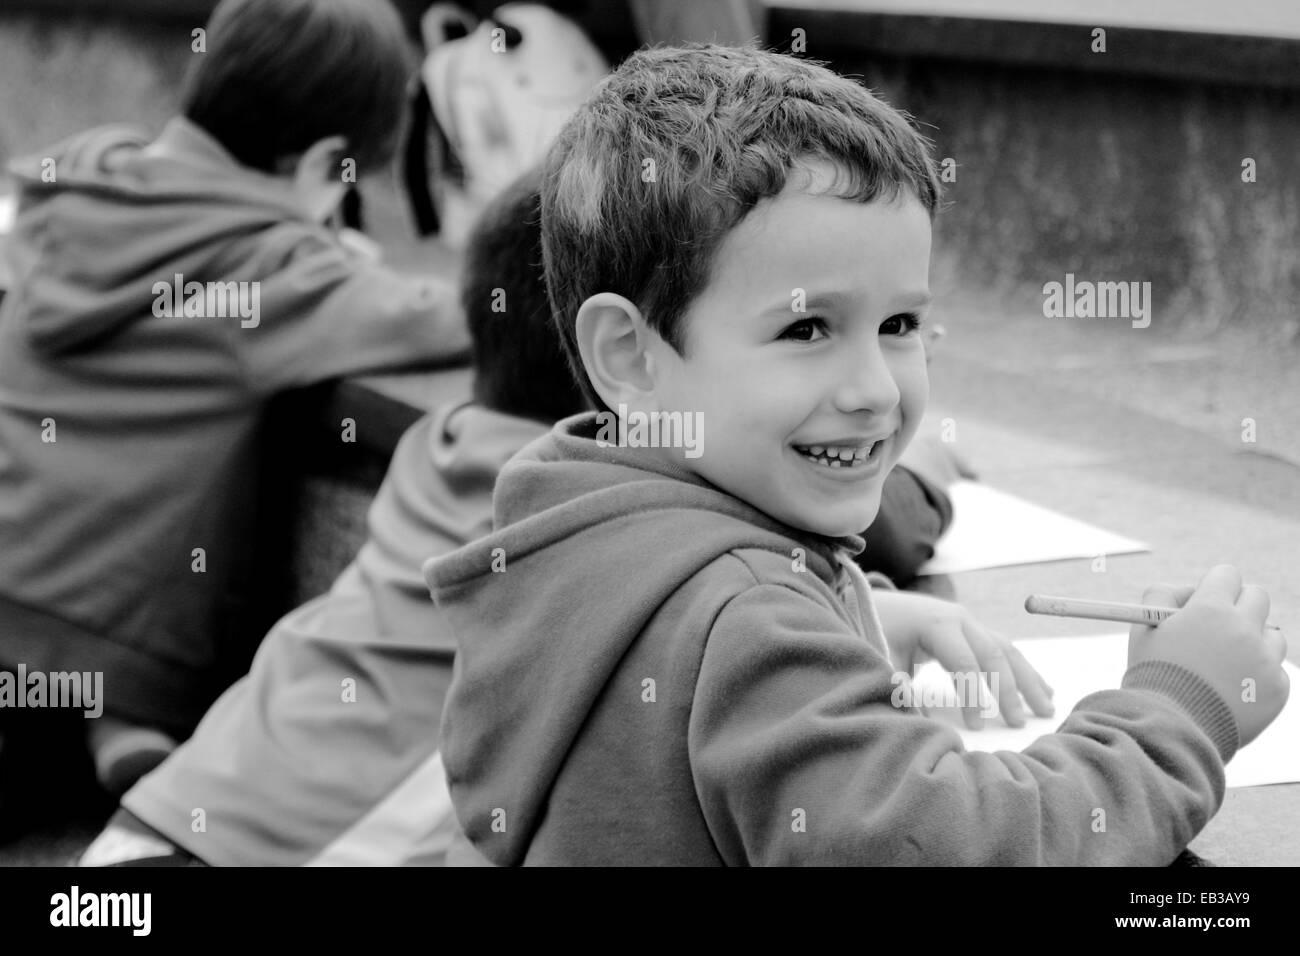 China, Hong Kong Island, Hong Kong, Boy (4-5) smiling while drawing, people in background - Stock Image